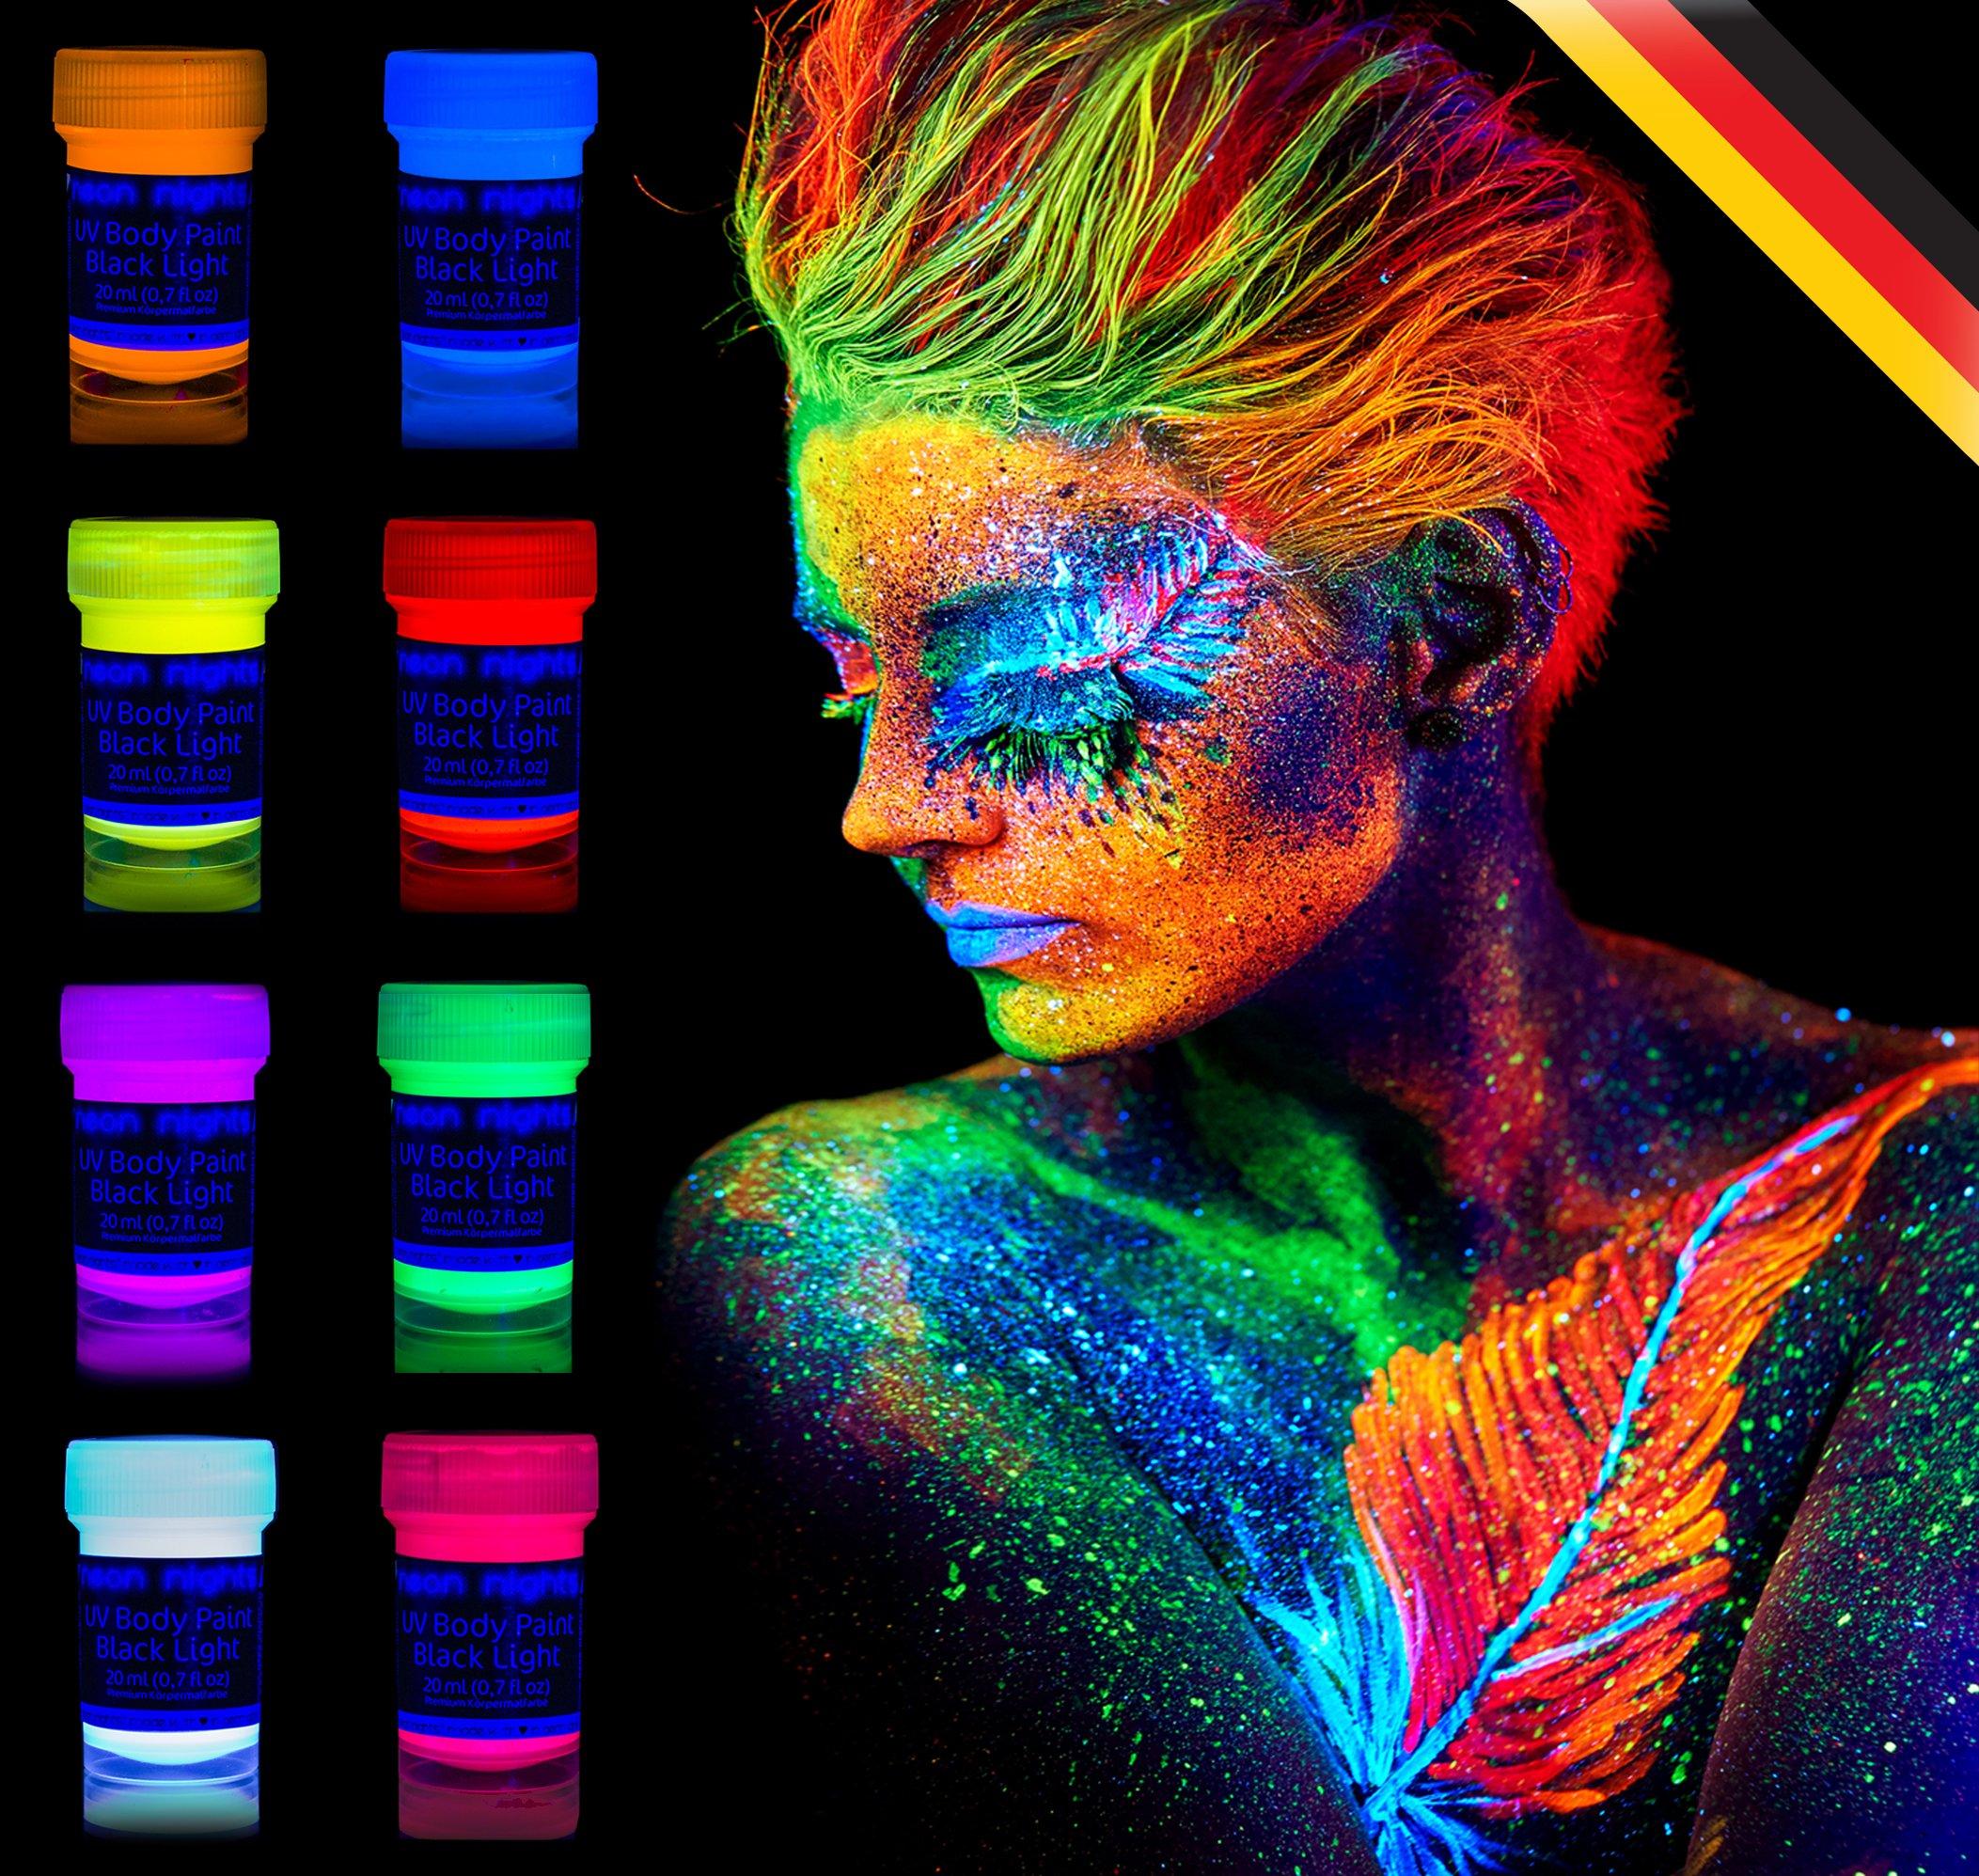 8 x UV Body Paint Black Light Make-Up Bodypainting Neon ...